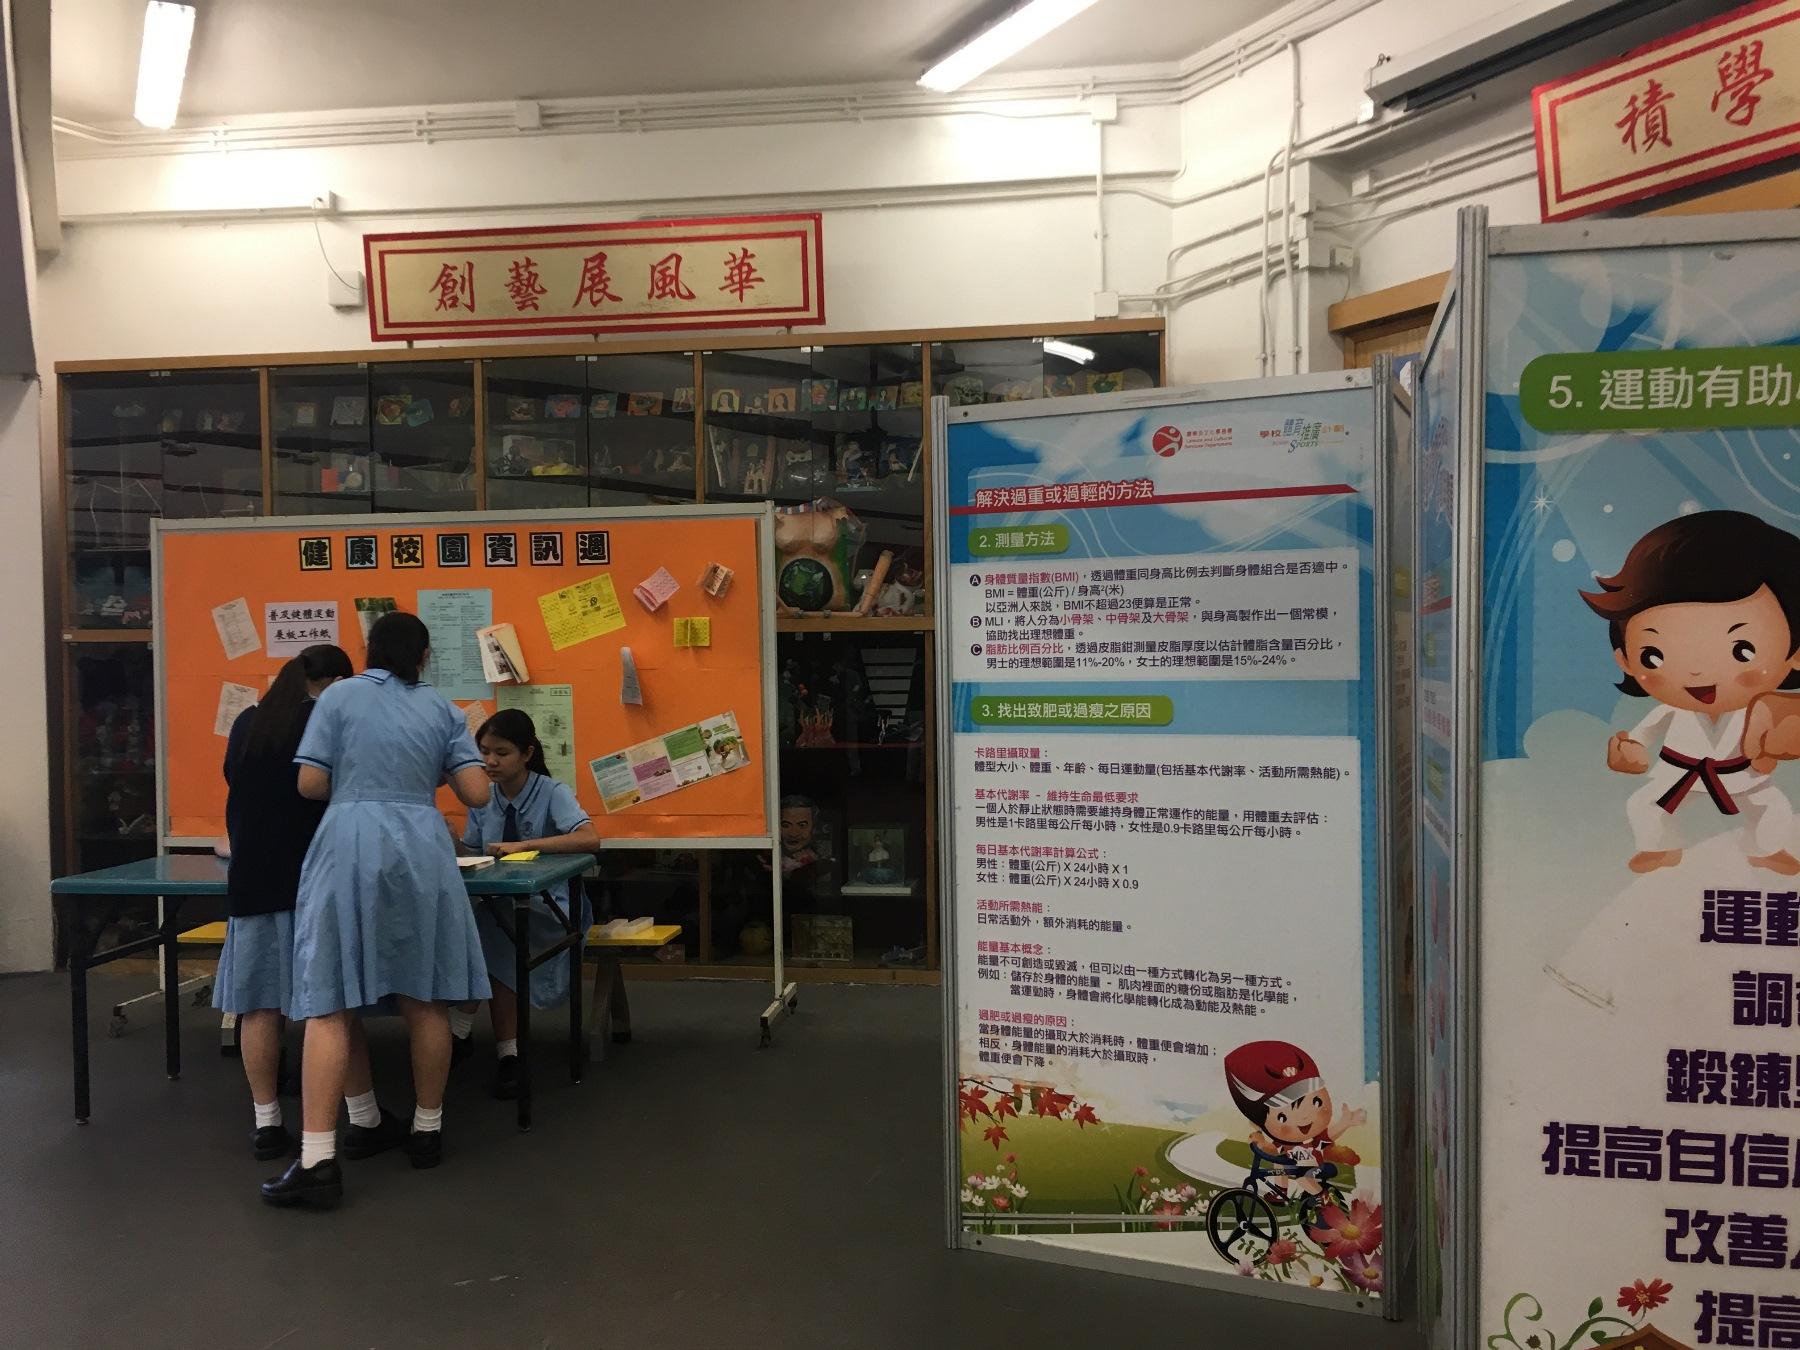 http://npc.edu.hk/sites/default/files/img_5363.jpg